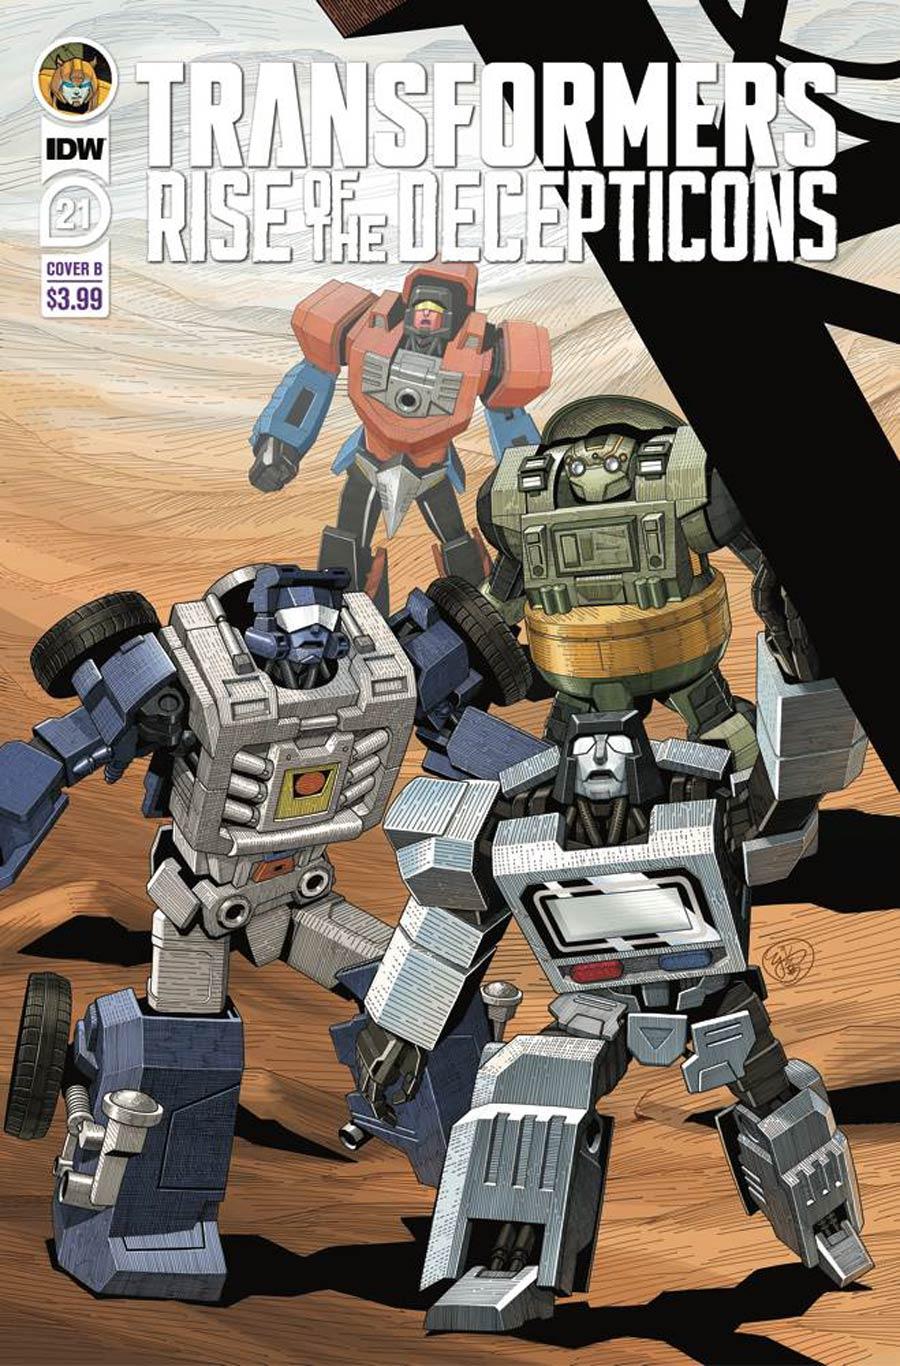 Transformers Vol 4 #21 Cover B Variant EJ Su Cover